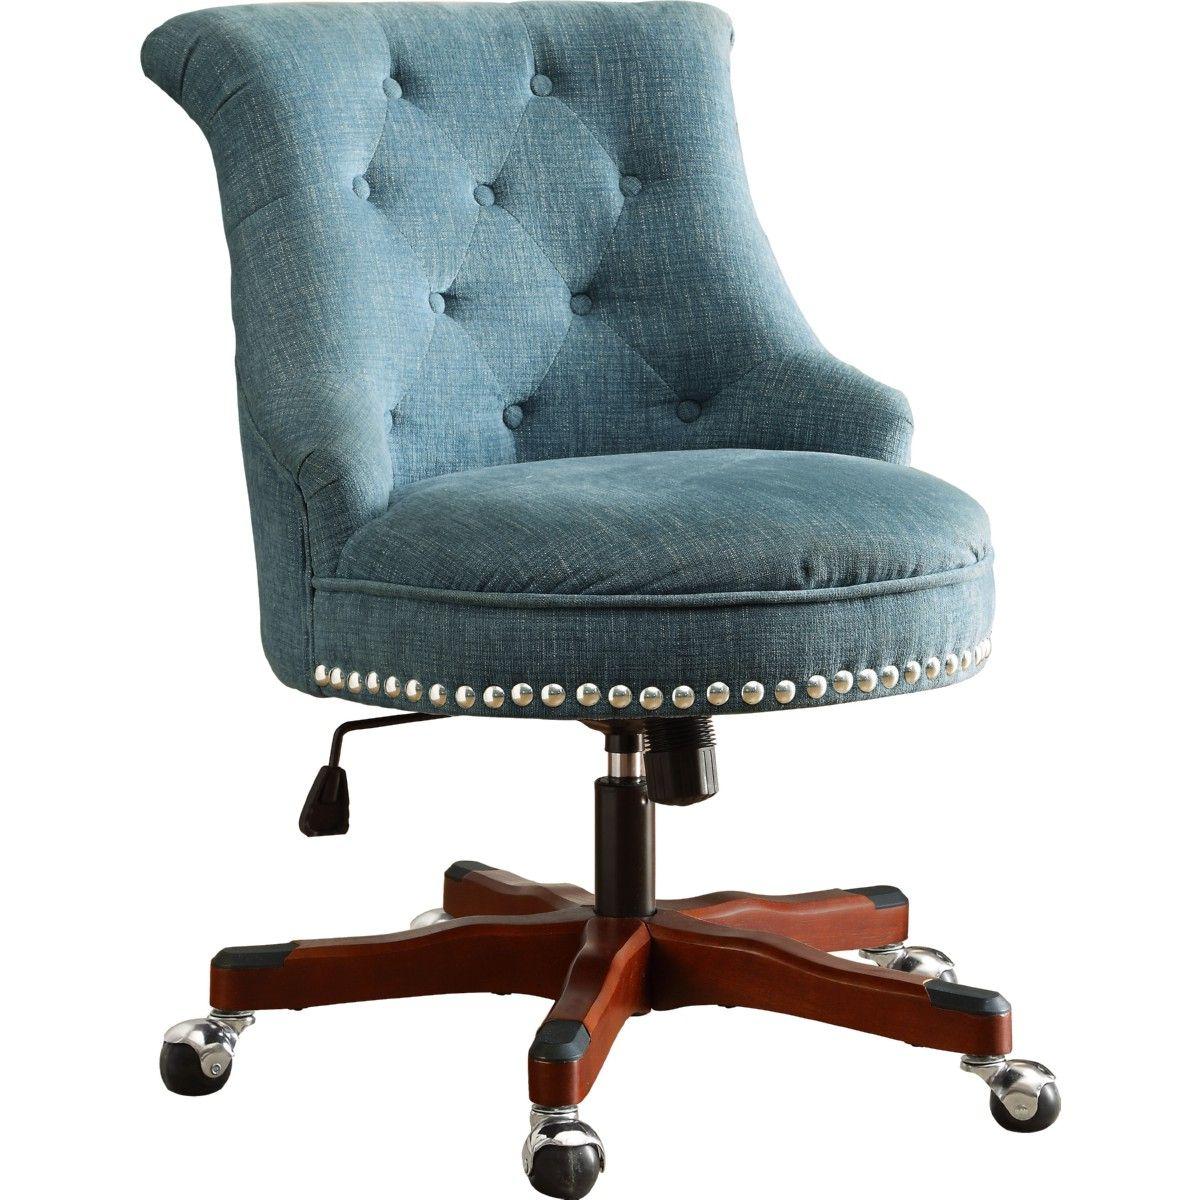 Linon 178403aqua01u Sinclair Office Chair Tufted Aqua Fabric Dark Walnut Wood Base